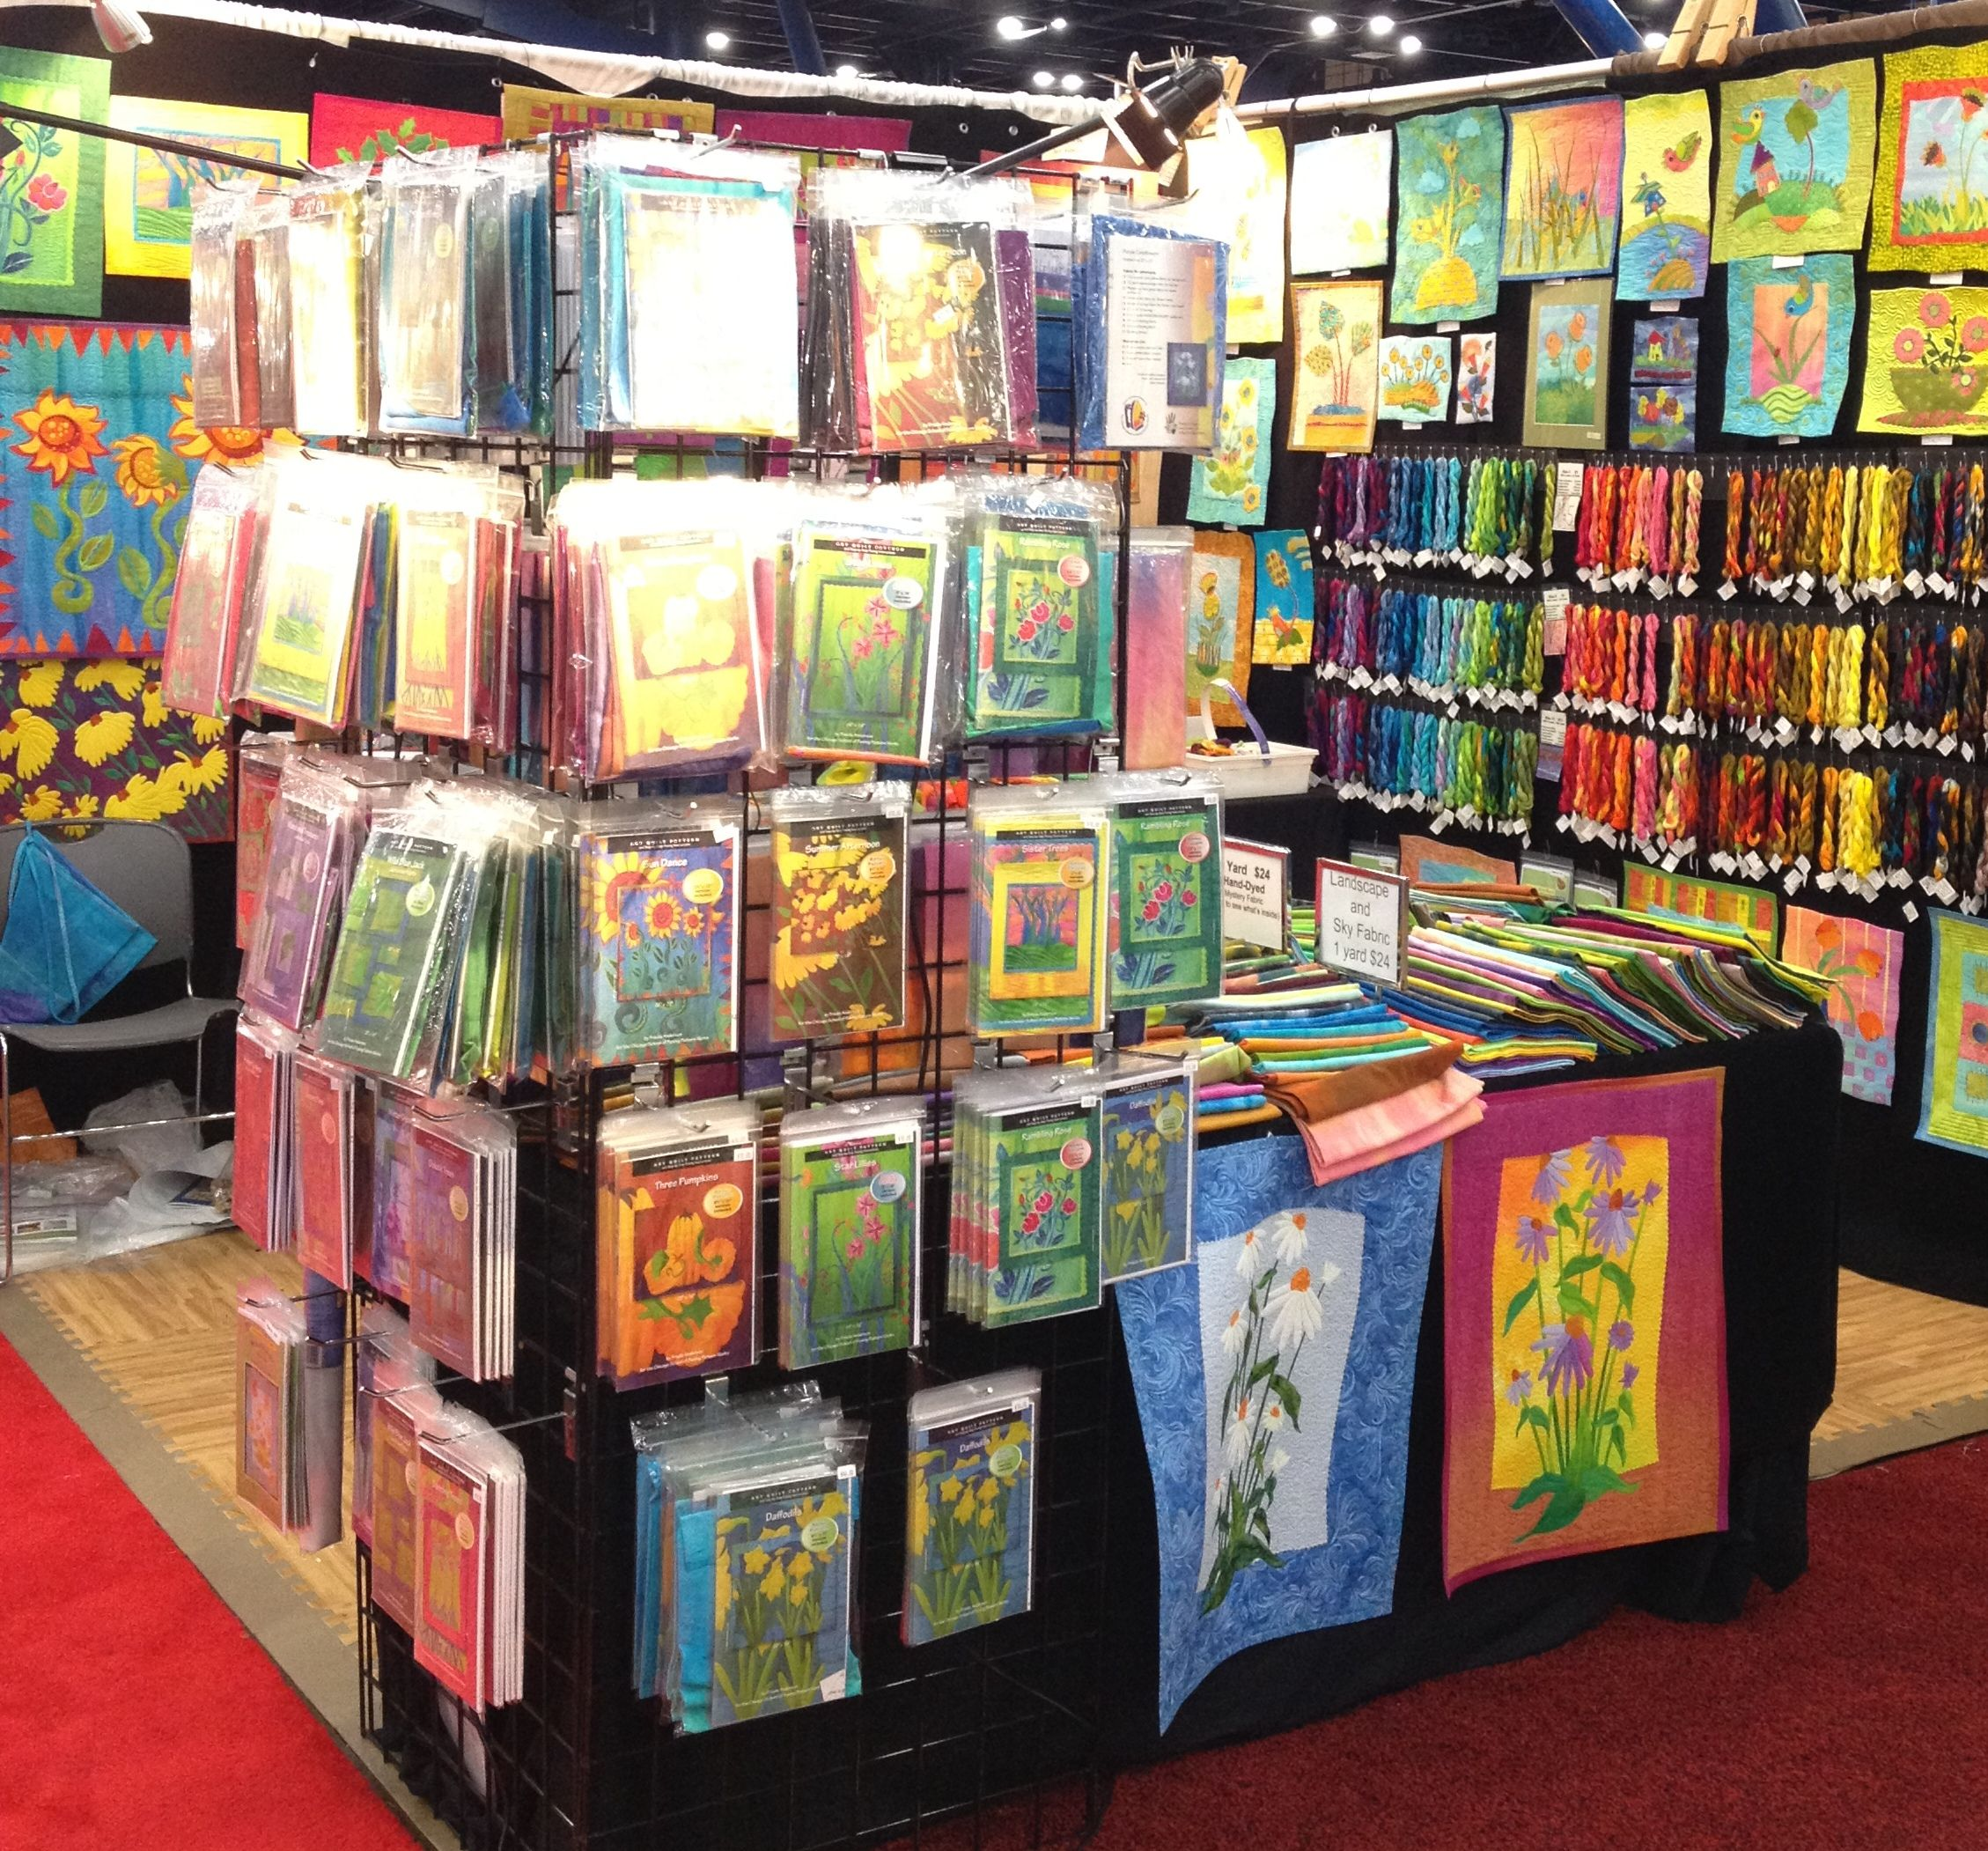 spring quilt shop ideas - Google Search   Quilt Shoppe   Pinterest : quilt shop search - Adamdwight.com